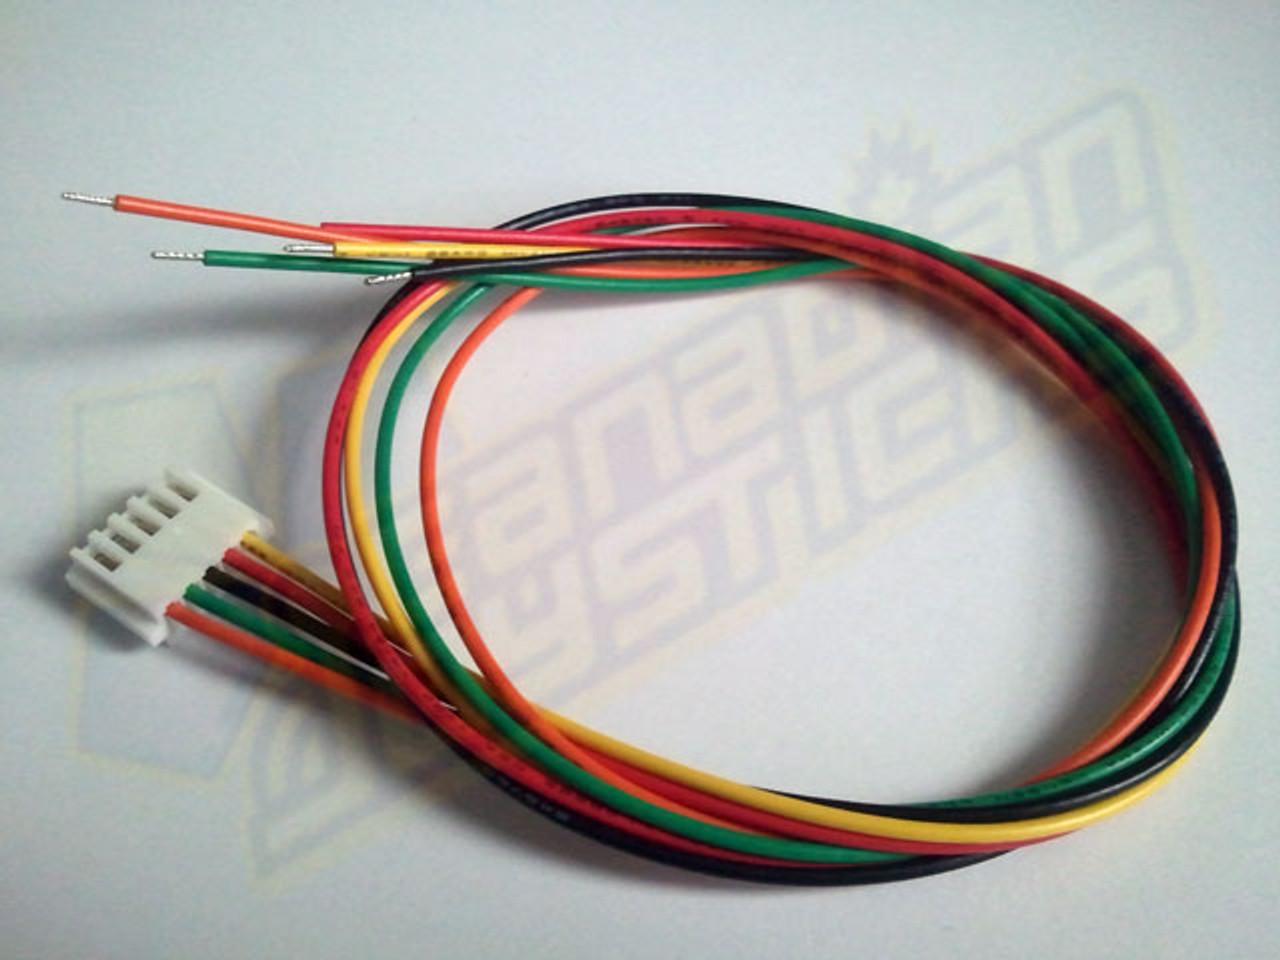 Sanwa_JLF H__12137.1306873457?c=2 category joysticks & parts sanwa denshi co ltd canadian sanwa wiring harness at panicattacktreatment.co